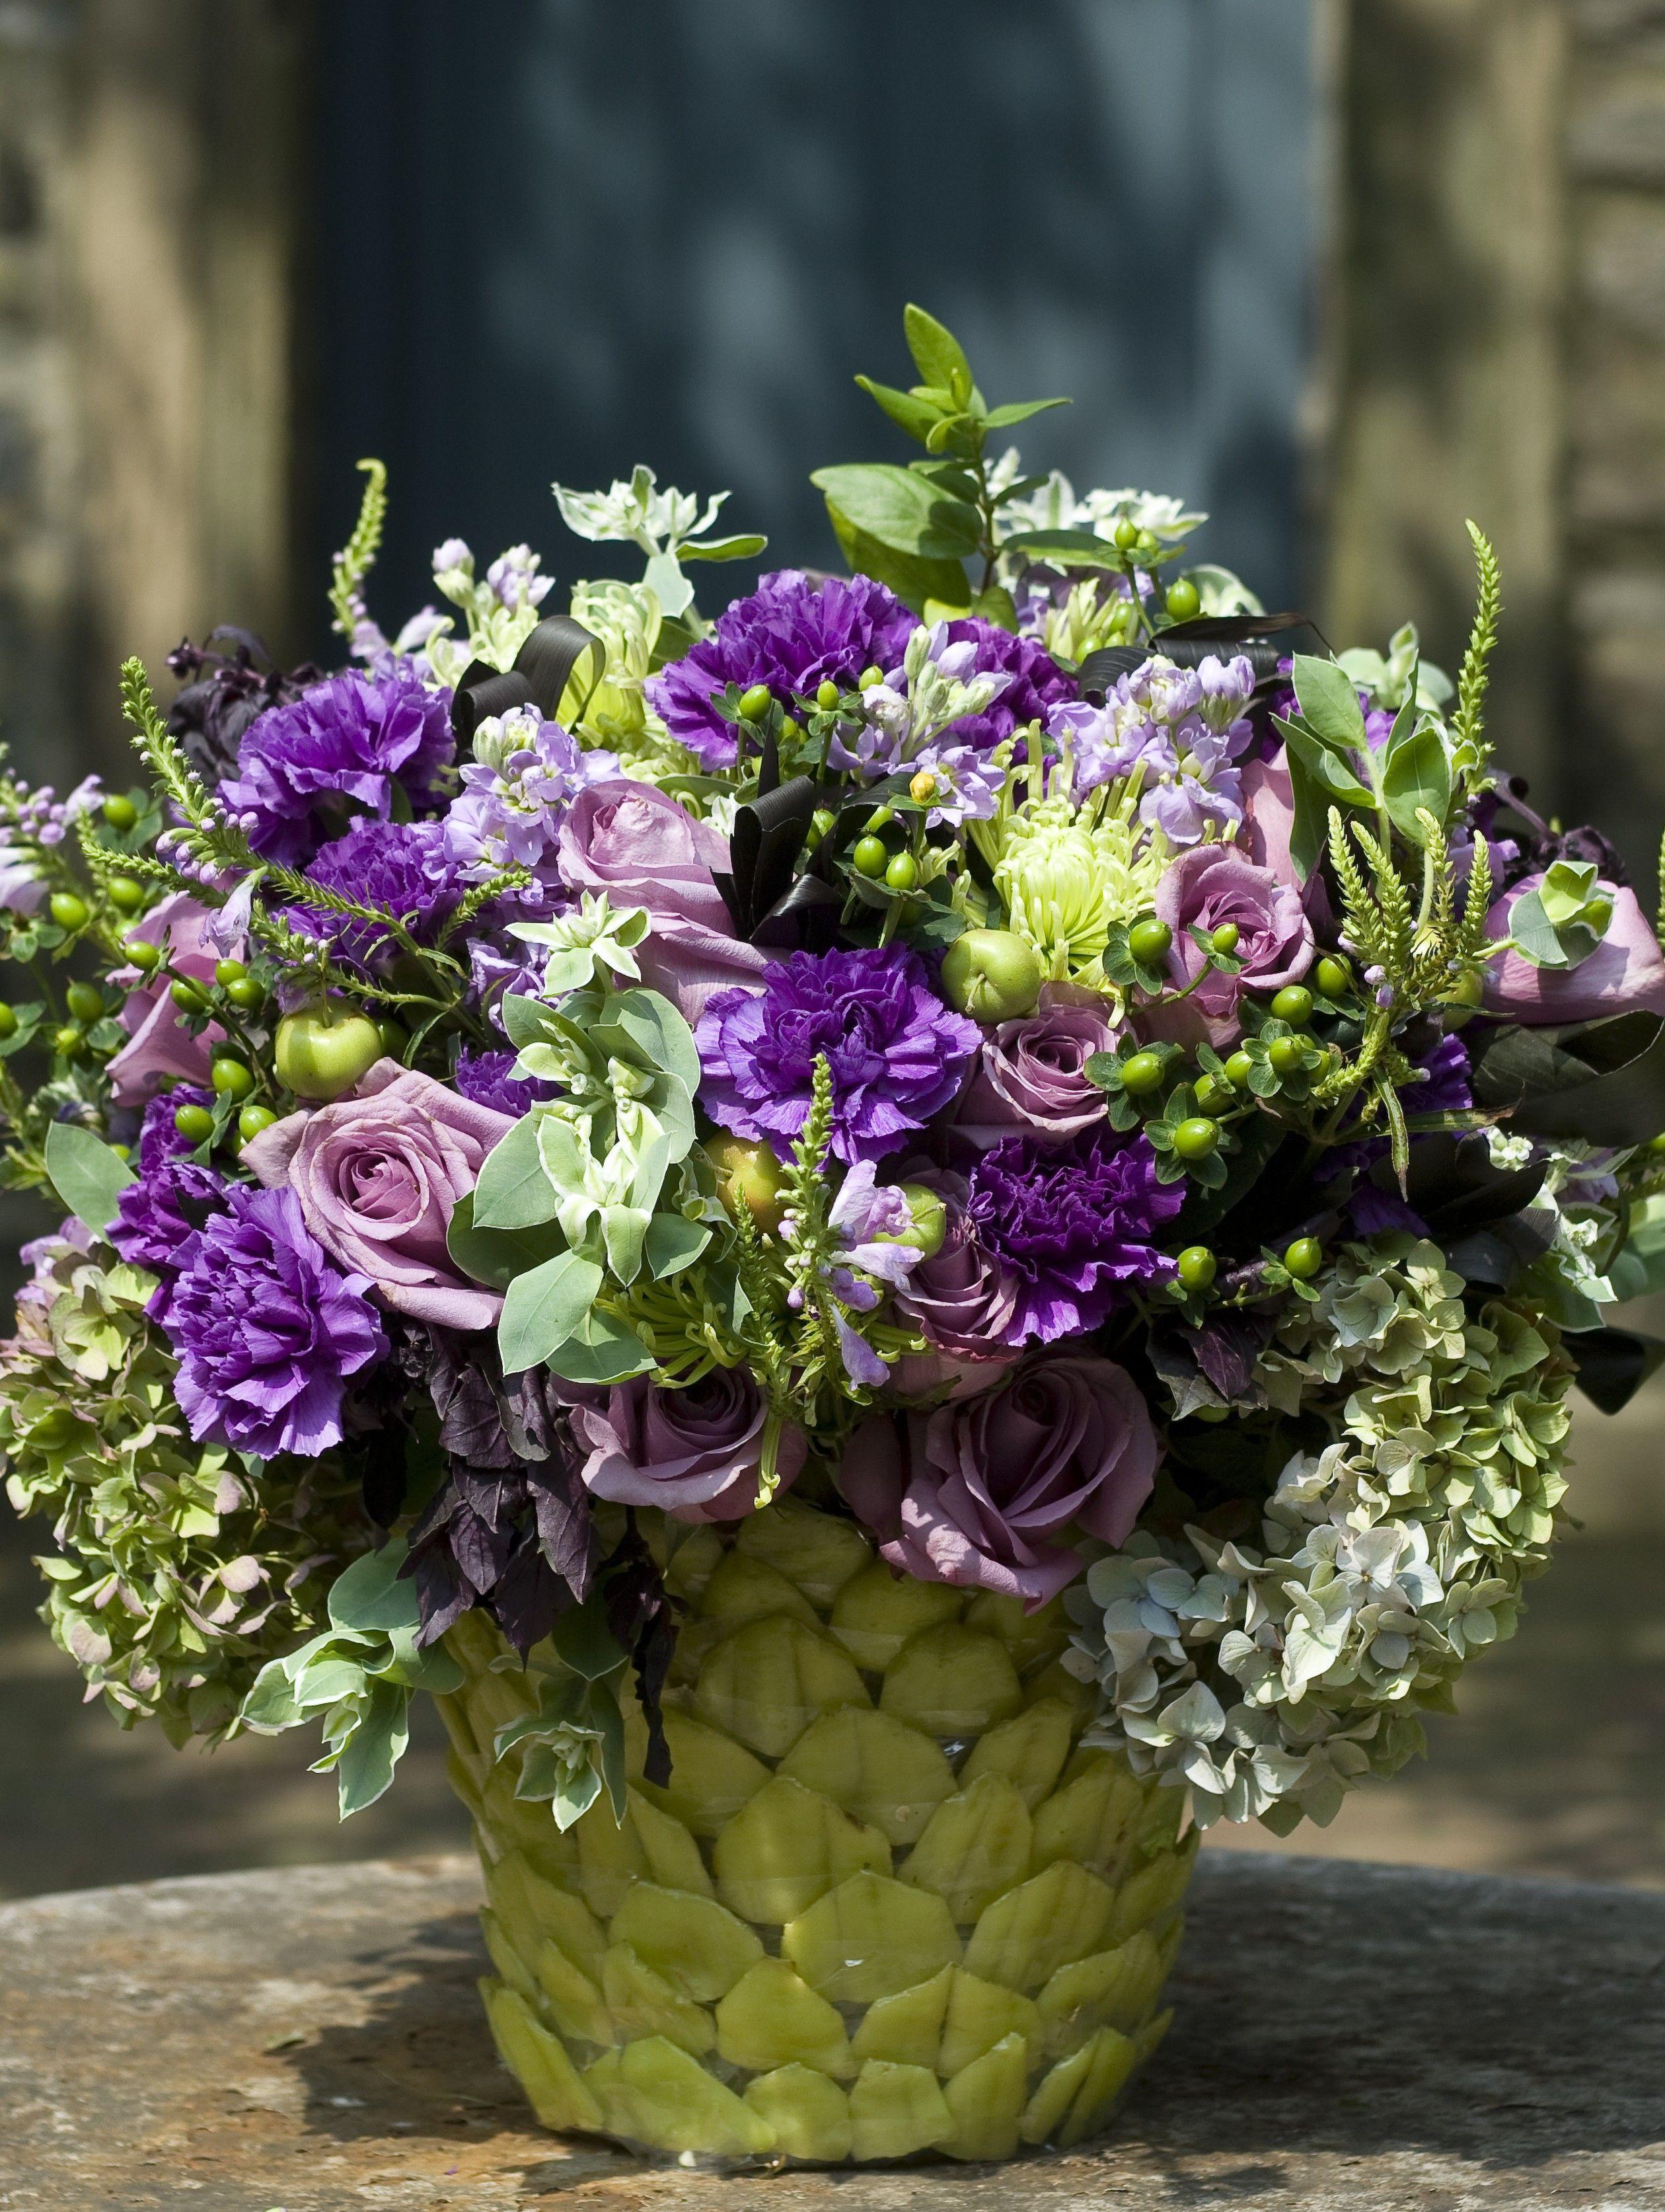 For an elegant companion to roses, place individual cymbidium ...